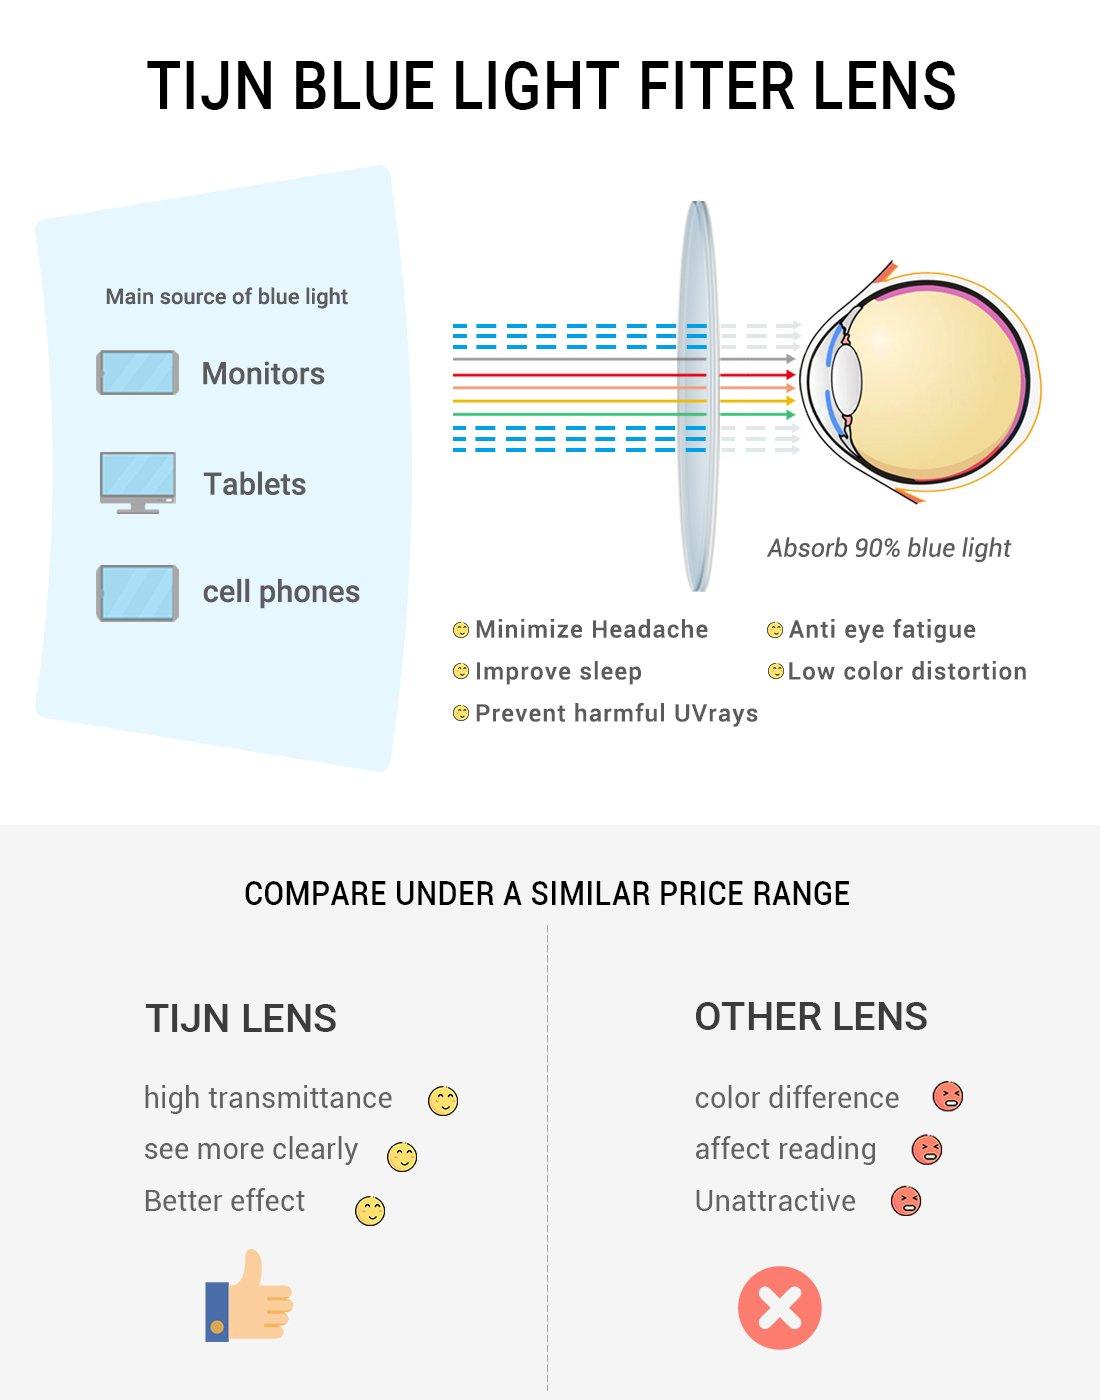 TIJN Round Blue Light Filter Computer Glasses Eyeglasses for Women Transparent Lens((Blue Light Block) Tortoise, 50) by TIJN (Image #4)